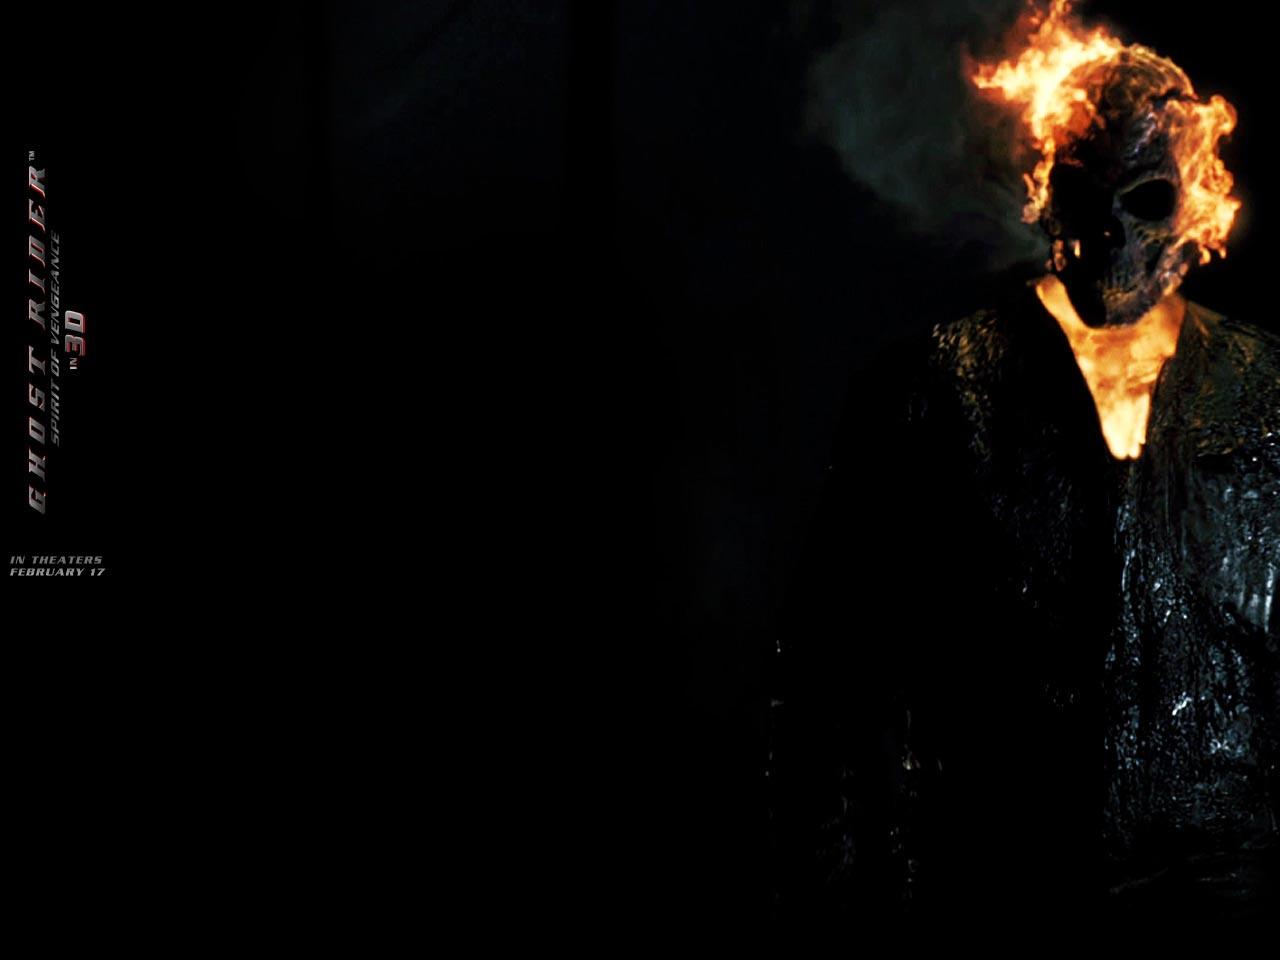 GHOST RIDER: SPIRIT OF VENGEANCE Wallpapers - FilmoFilia